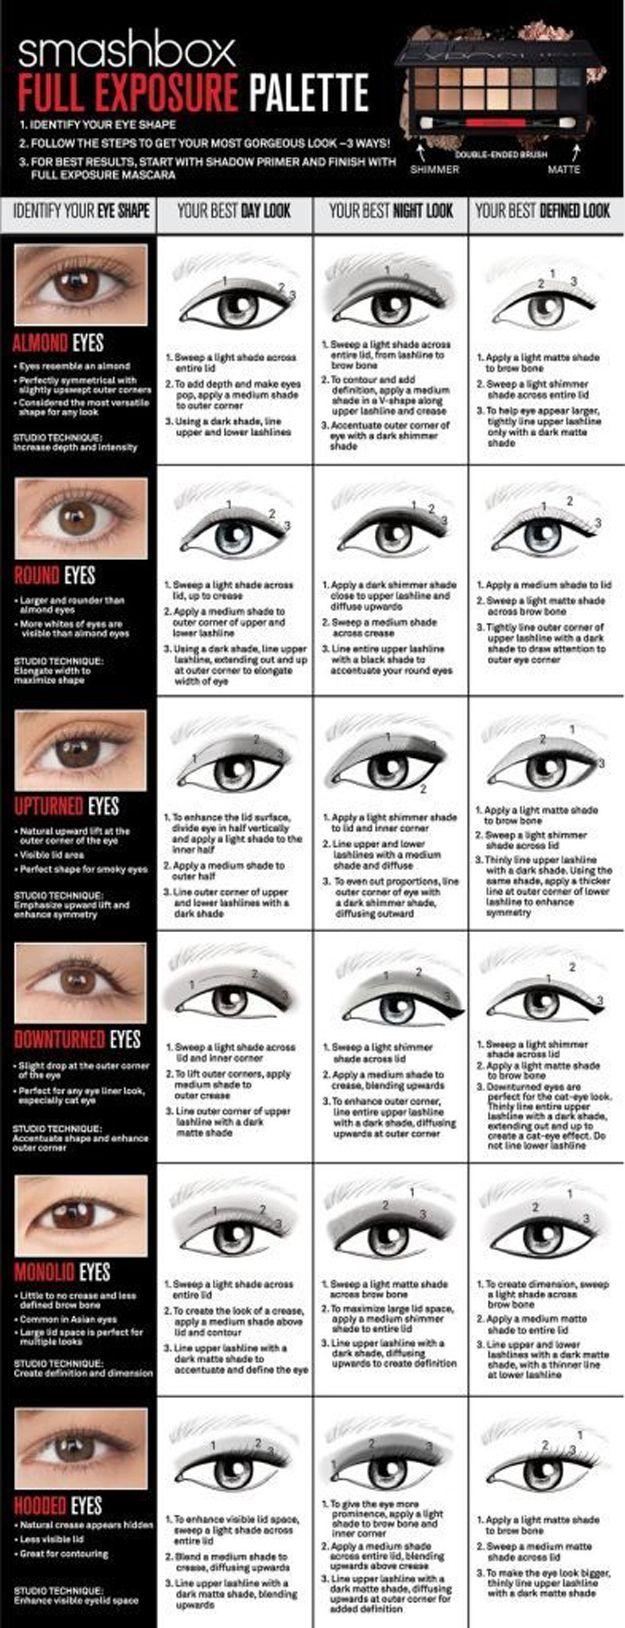 Eye Makeup Tips | Best Eyeliner and Eyeshadow Tips by Makeup Tutorials at http://makeuptutorials.com/makeup-tutorials-beauty-tips